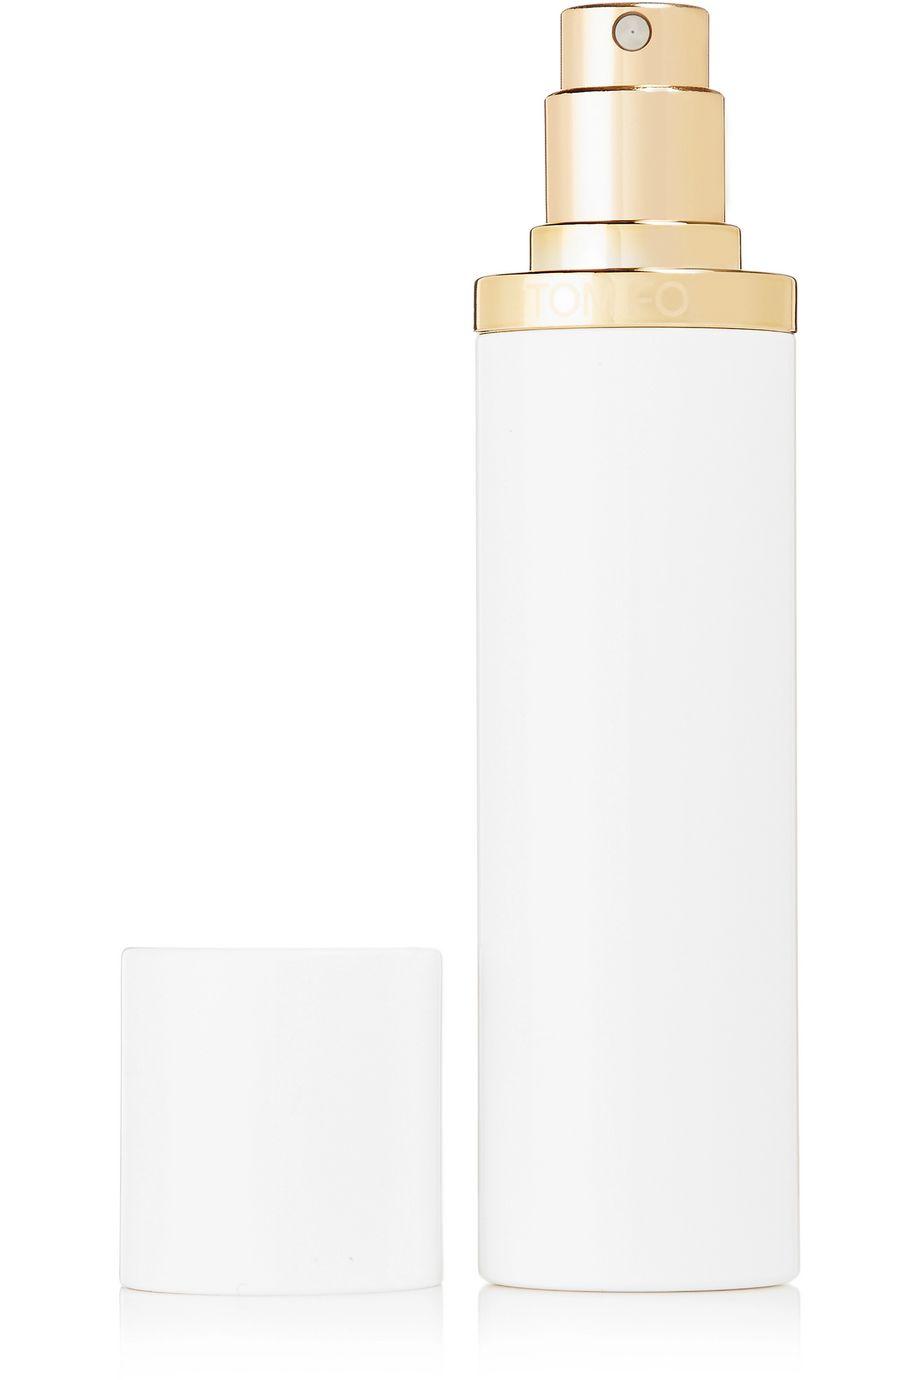 TOM FORD BEAUTY Soleil Blanc, 10 ml – Eau de Parfum